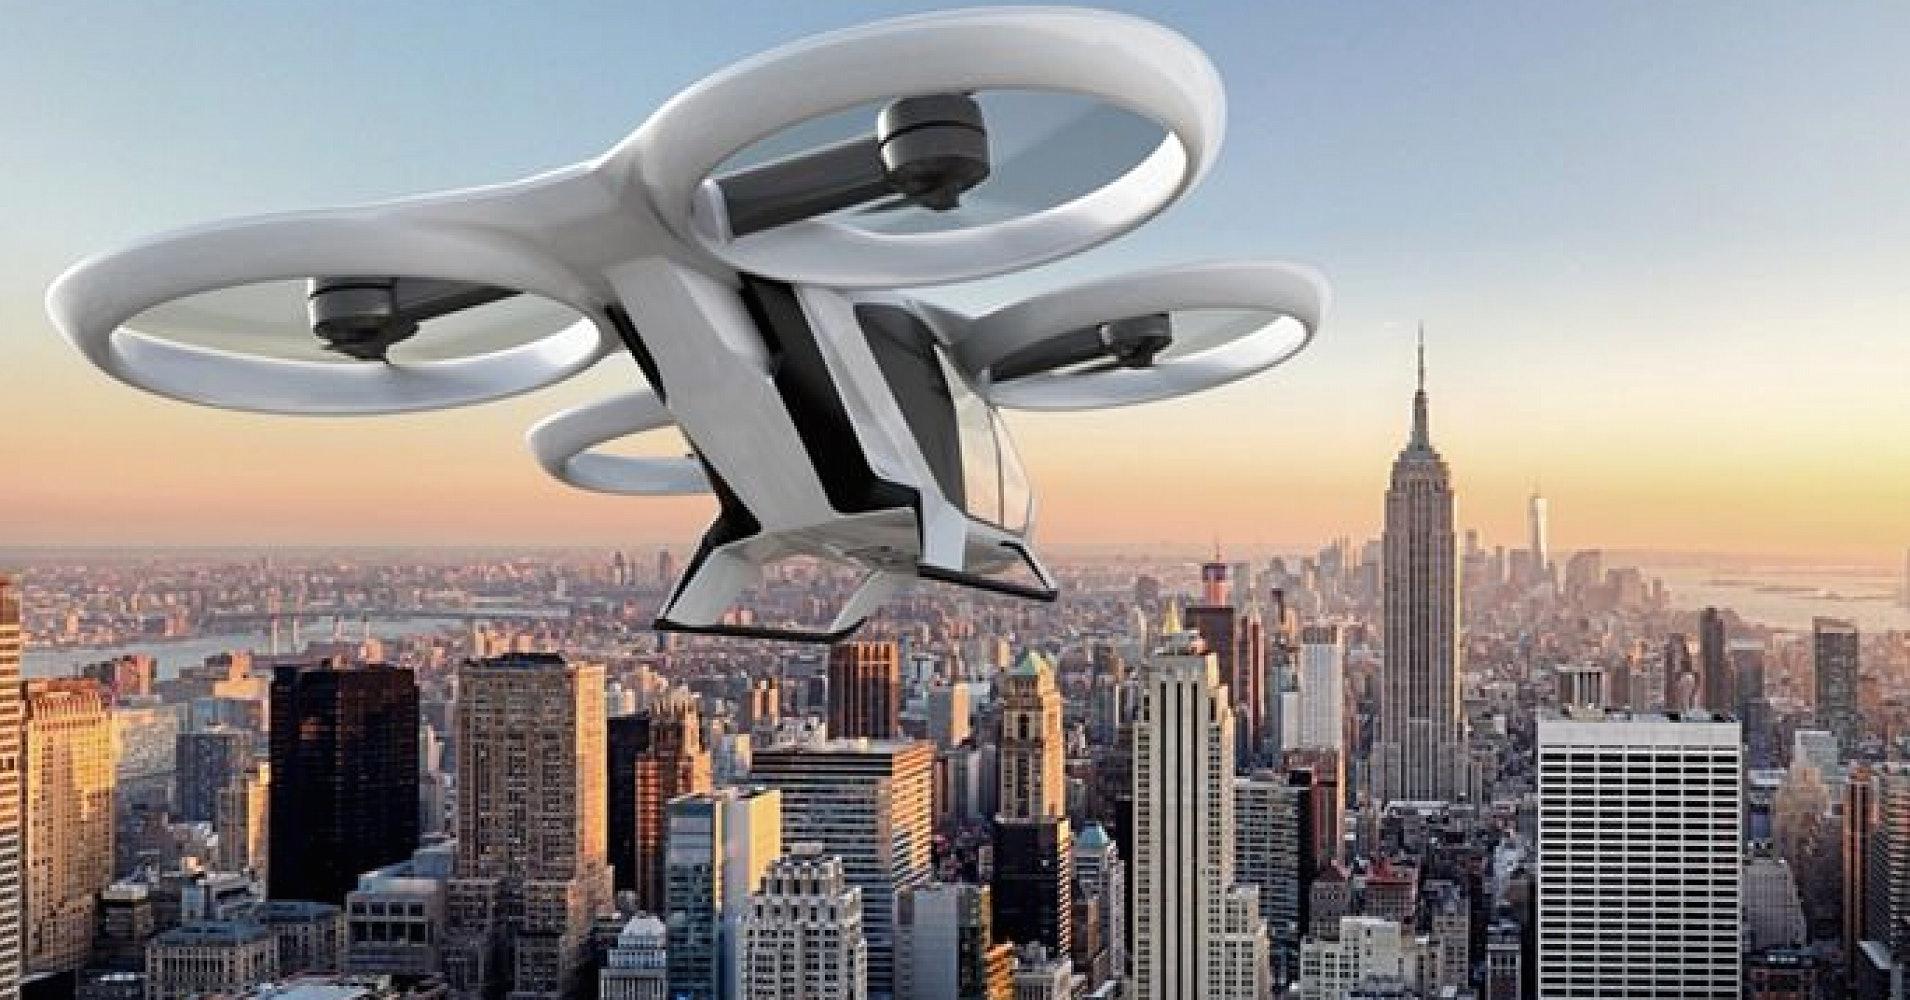 cityairbus-flying-taxi